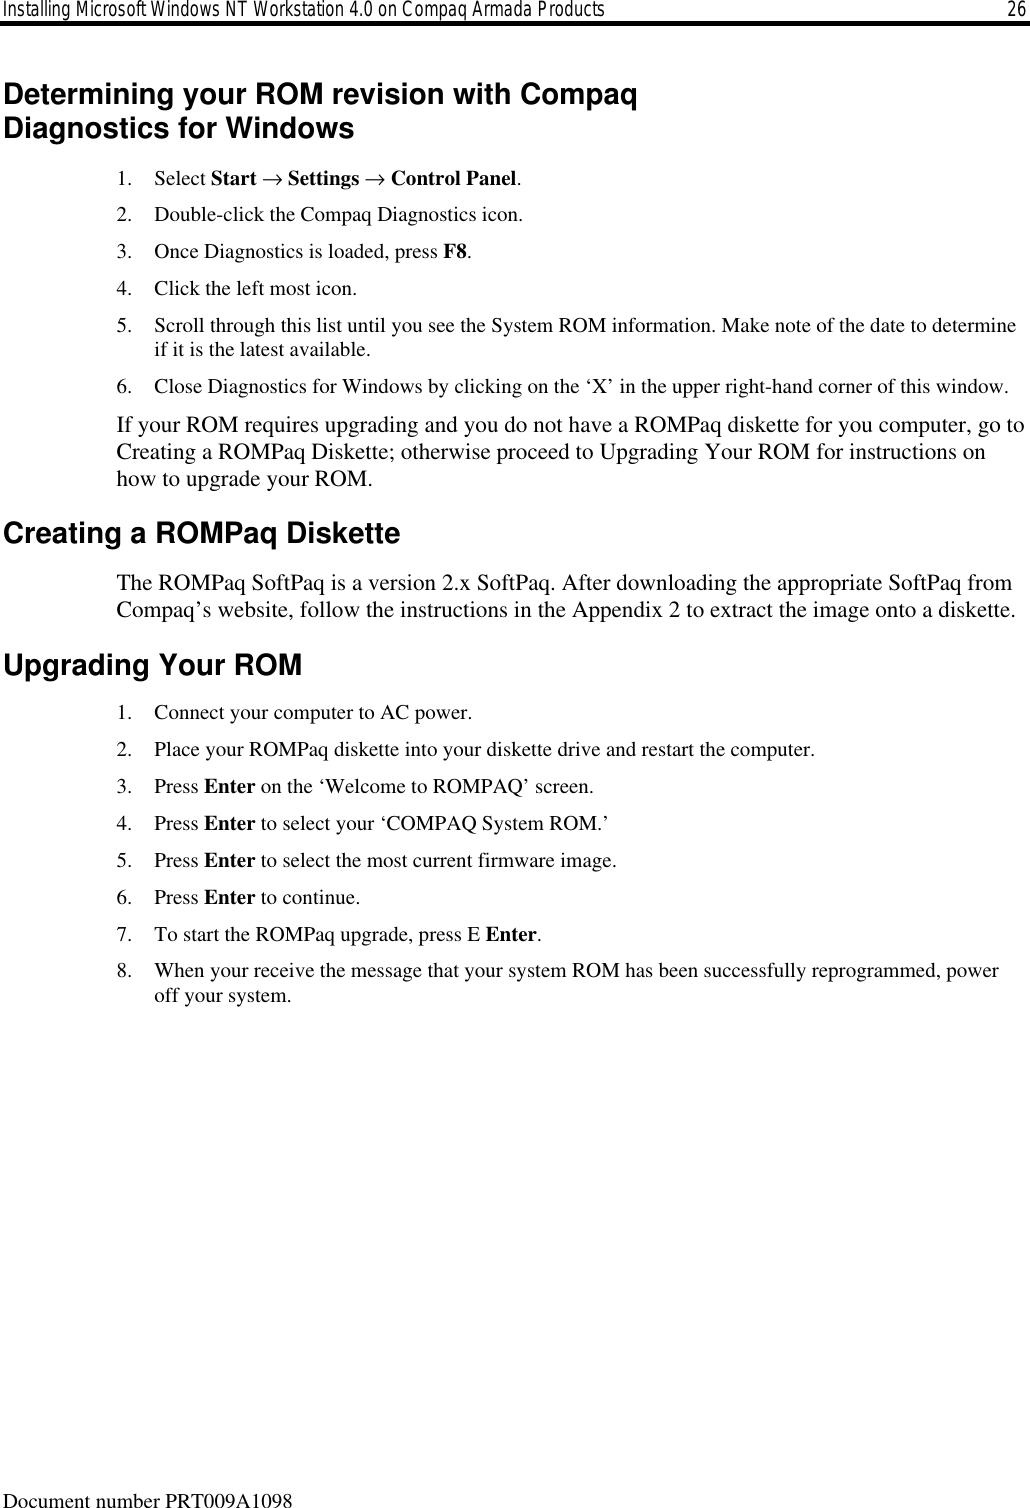 HP PRT009A_1098 Installing Microsoft Windows NT Workstation